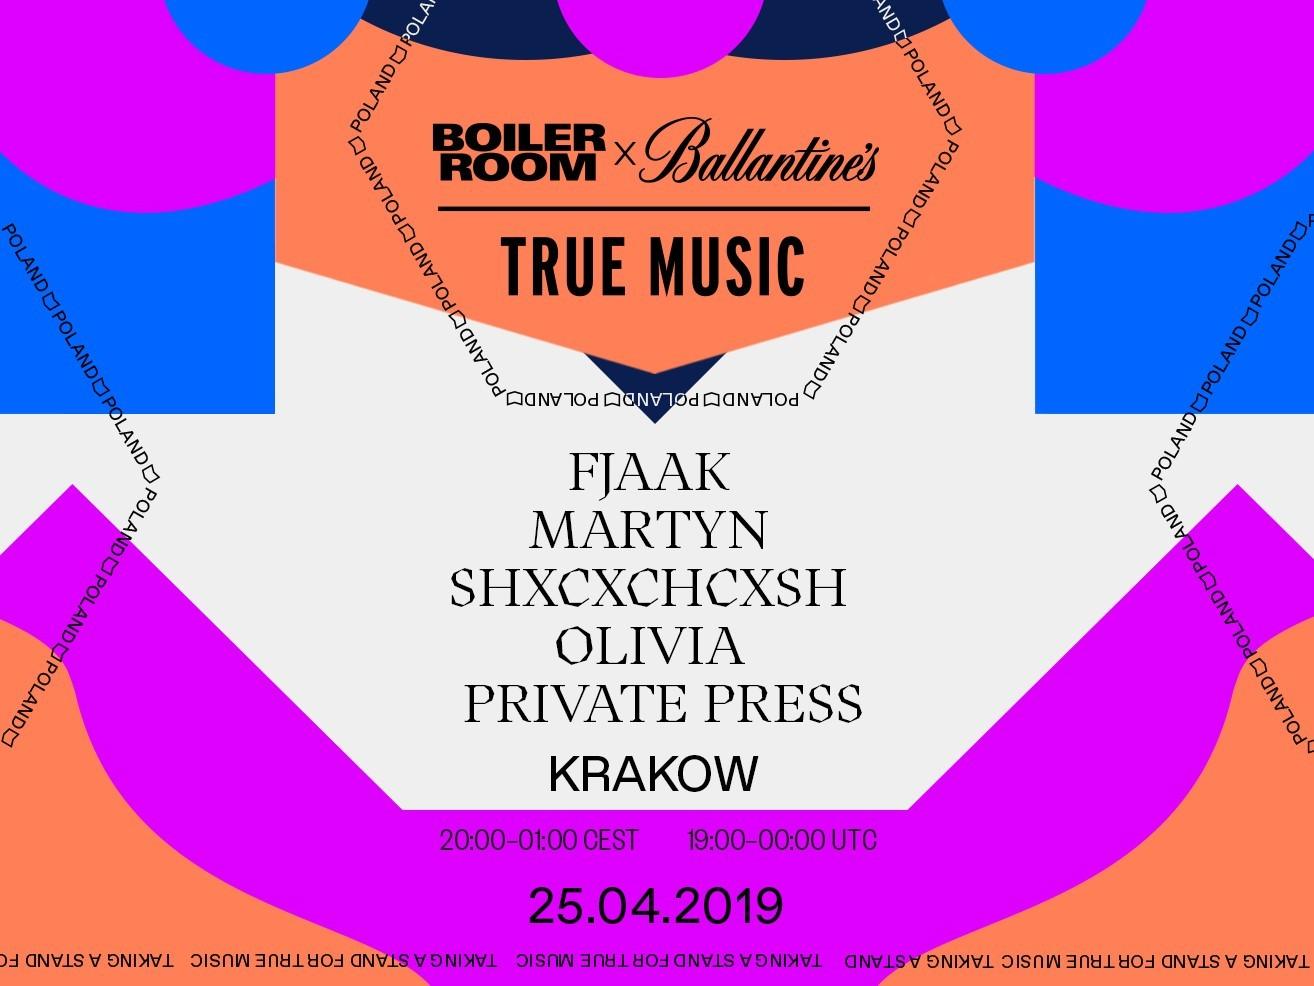 TBOILER ROOM X BALLANTINE'S TRUE MUSIC КРАКІВ